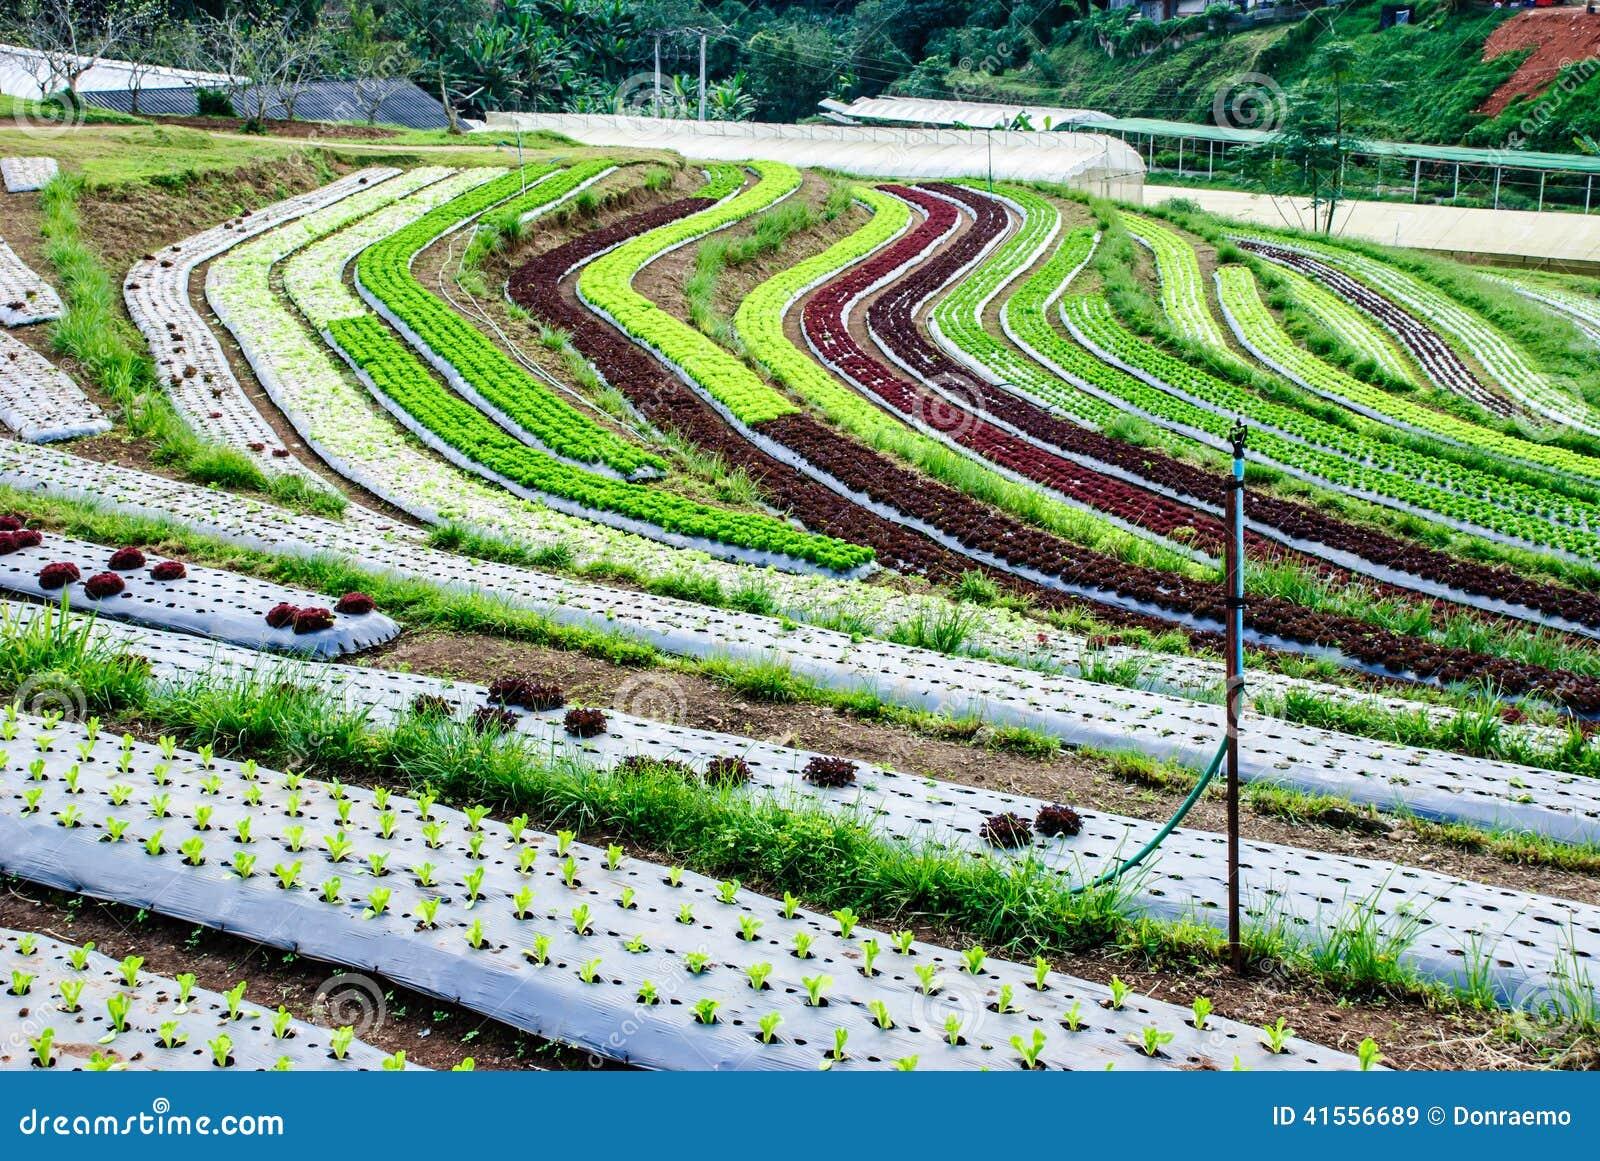 Terrace farming stock photo image 41556689 for Terrace farming